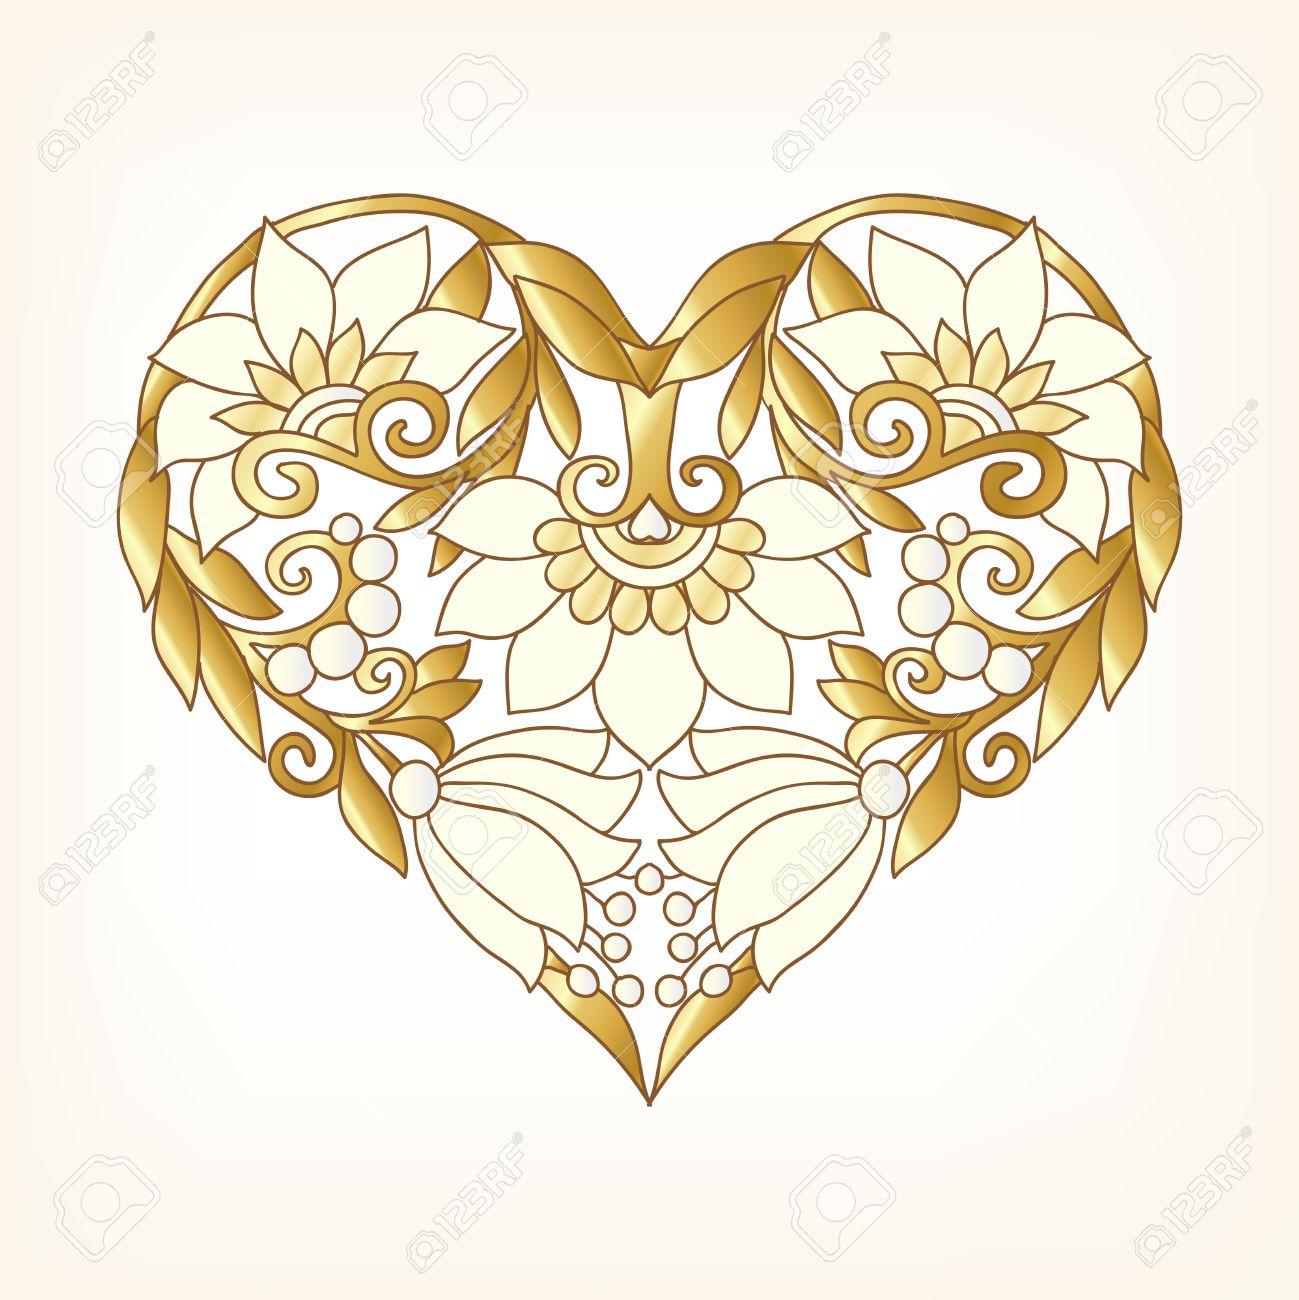 Gold Love Heart on whita background. Vector illustration. In...